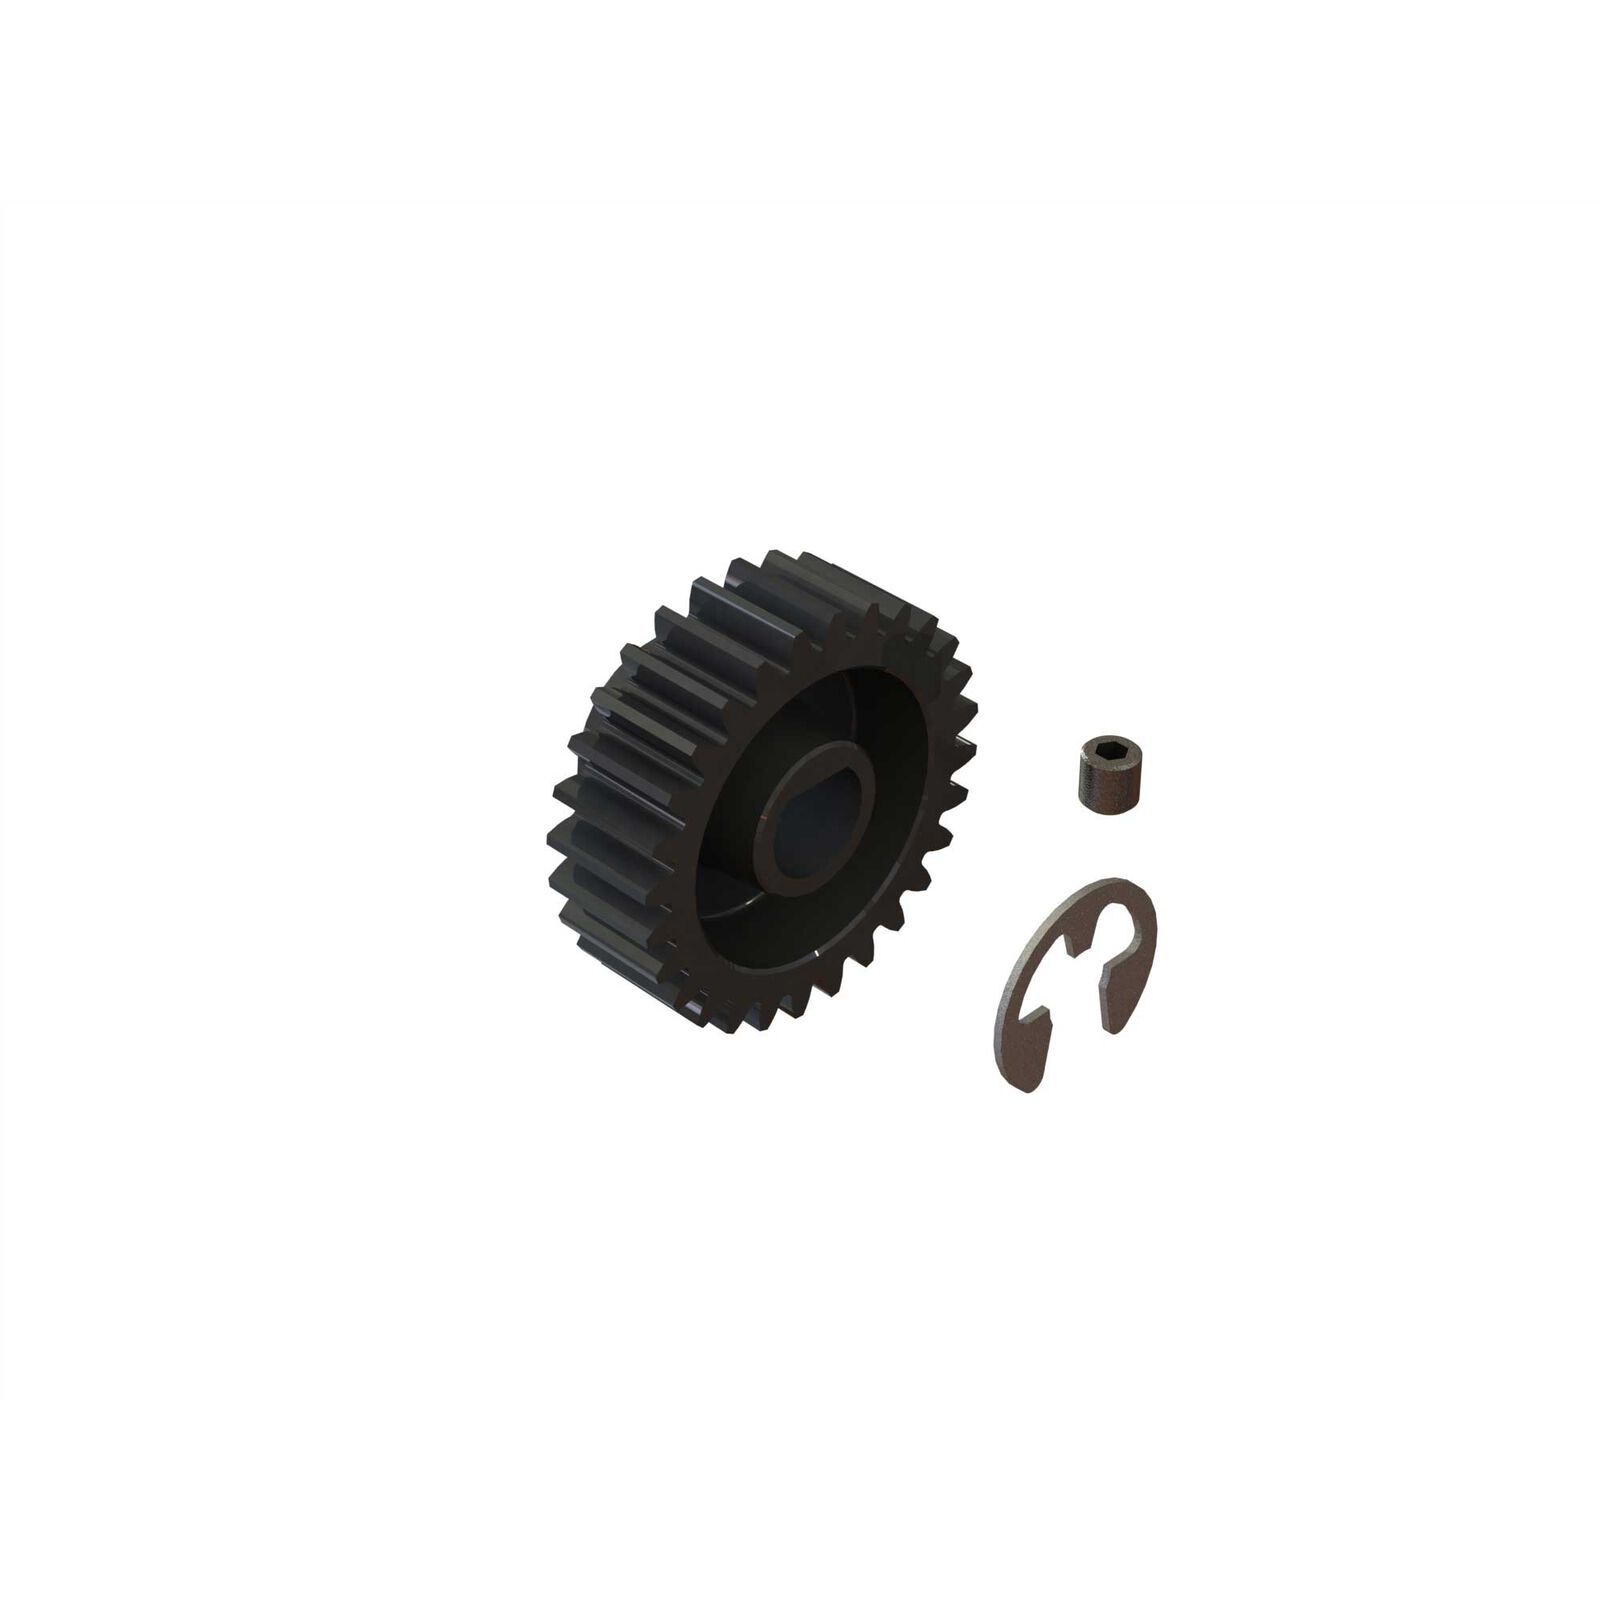 28T Mod1 Safe-D8 Pinion Gear